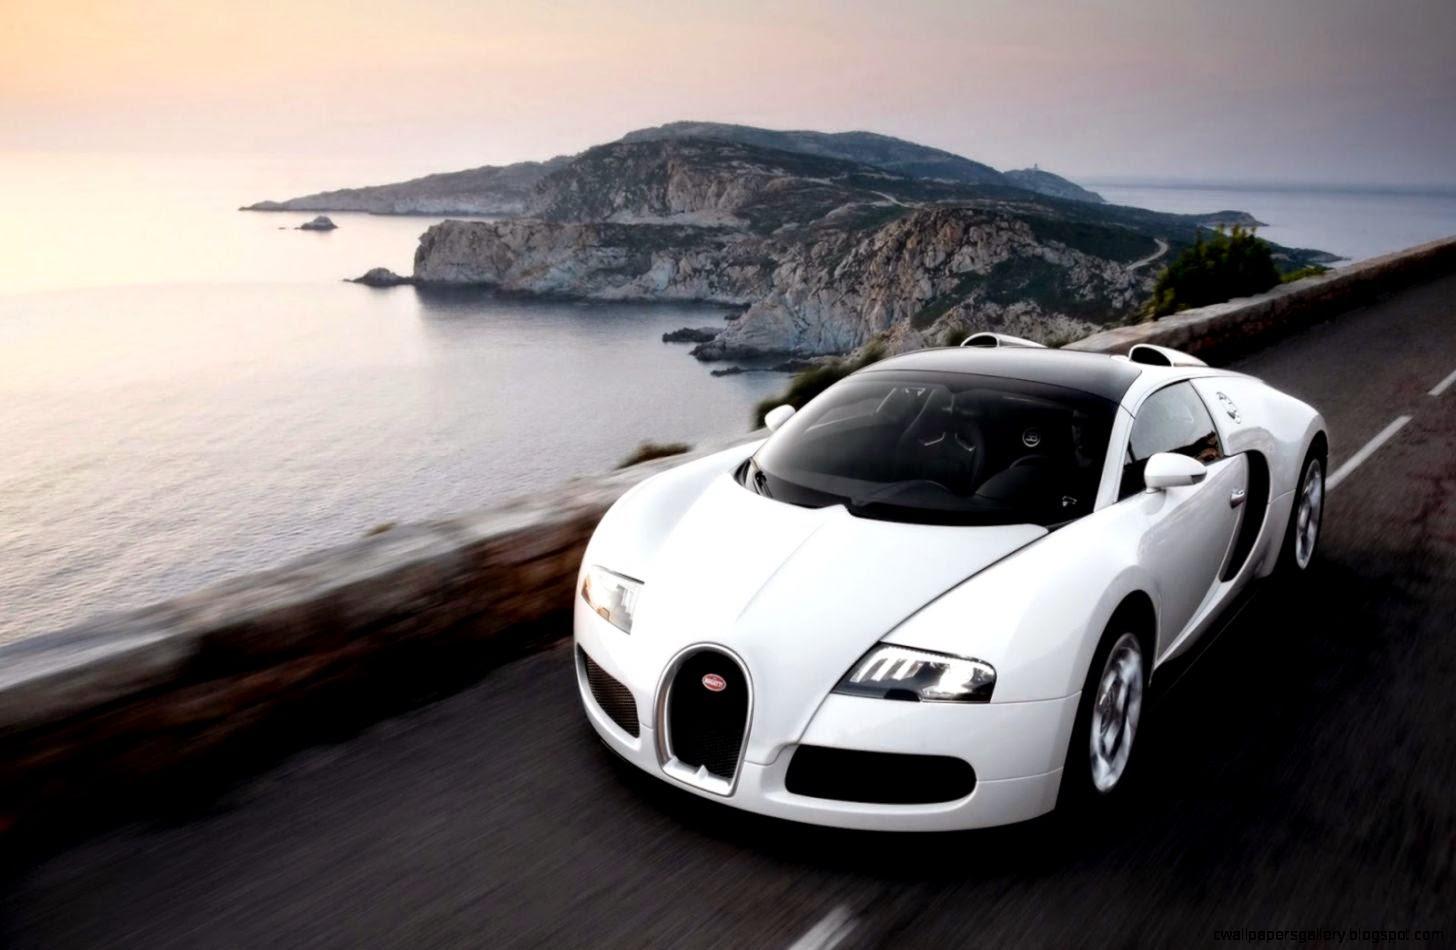 Bugatti Veyron Super Sport Gold Wallpaper: Bugatti Veyron Super Sport White Silver